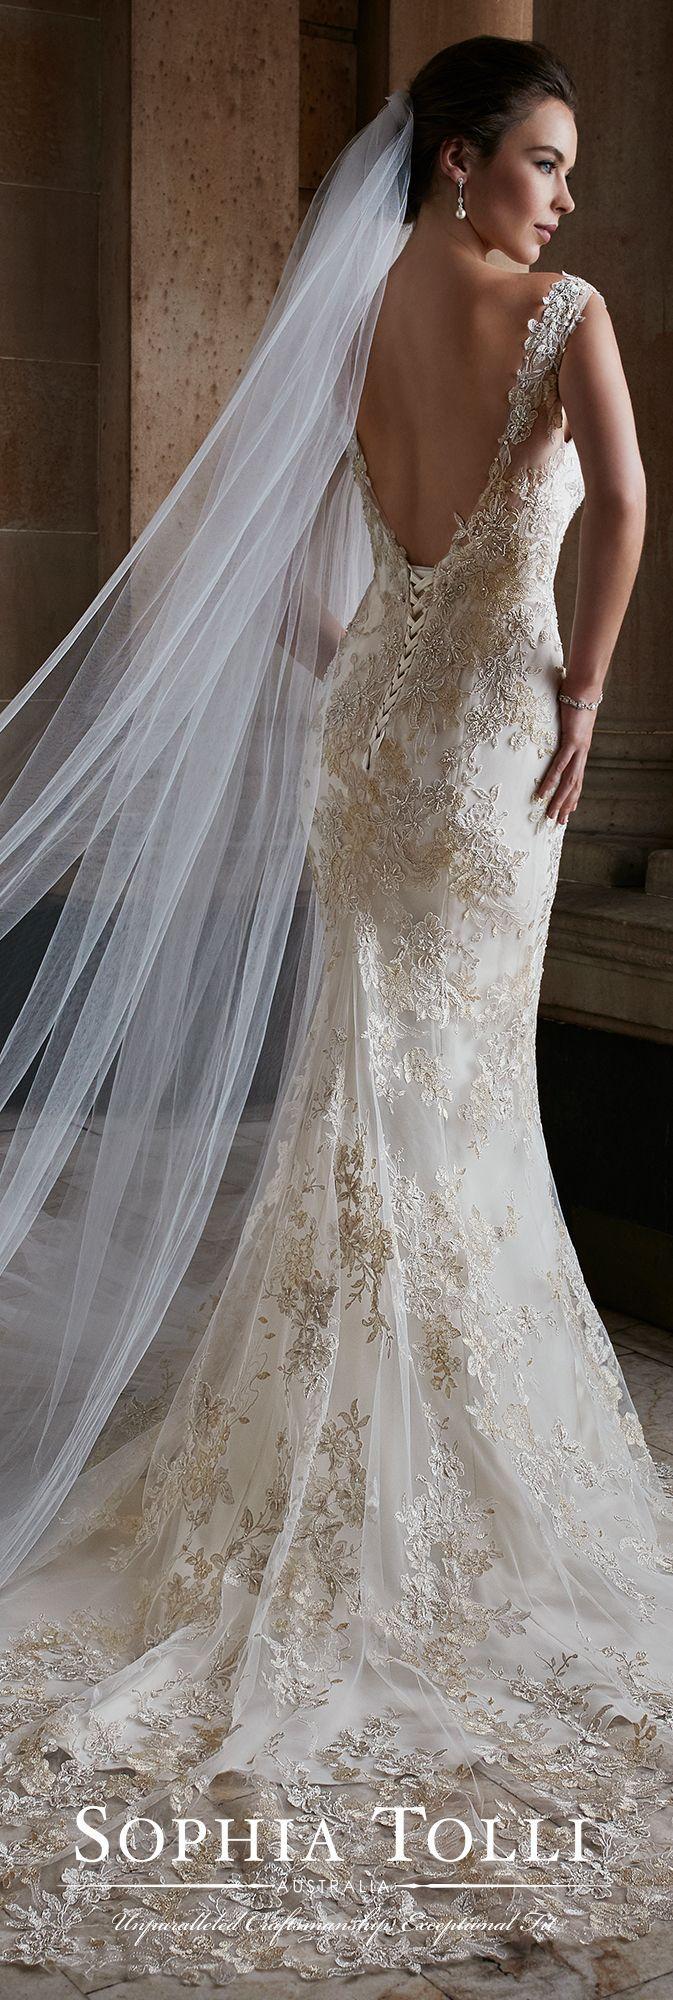 Свадьба - Sleeveless Lace Fit & Flare Open Back Wedding Dress - Sophia Tolli Y21736